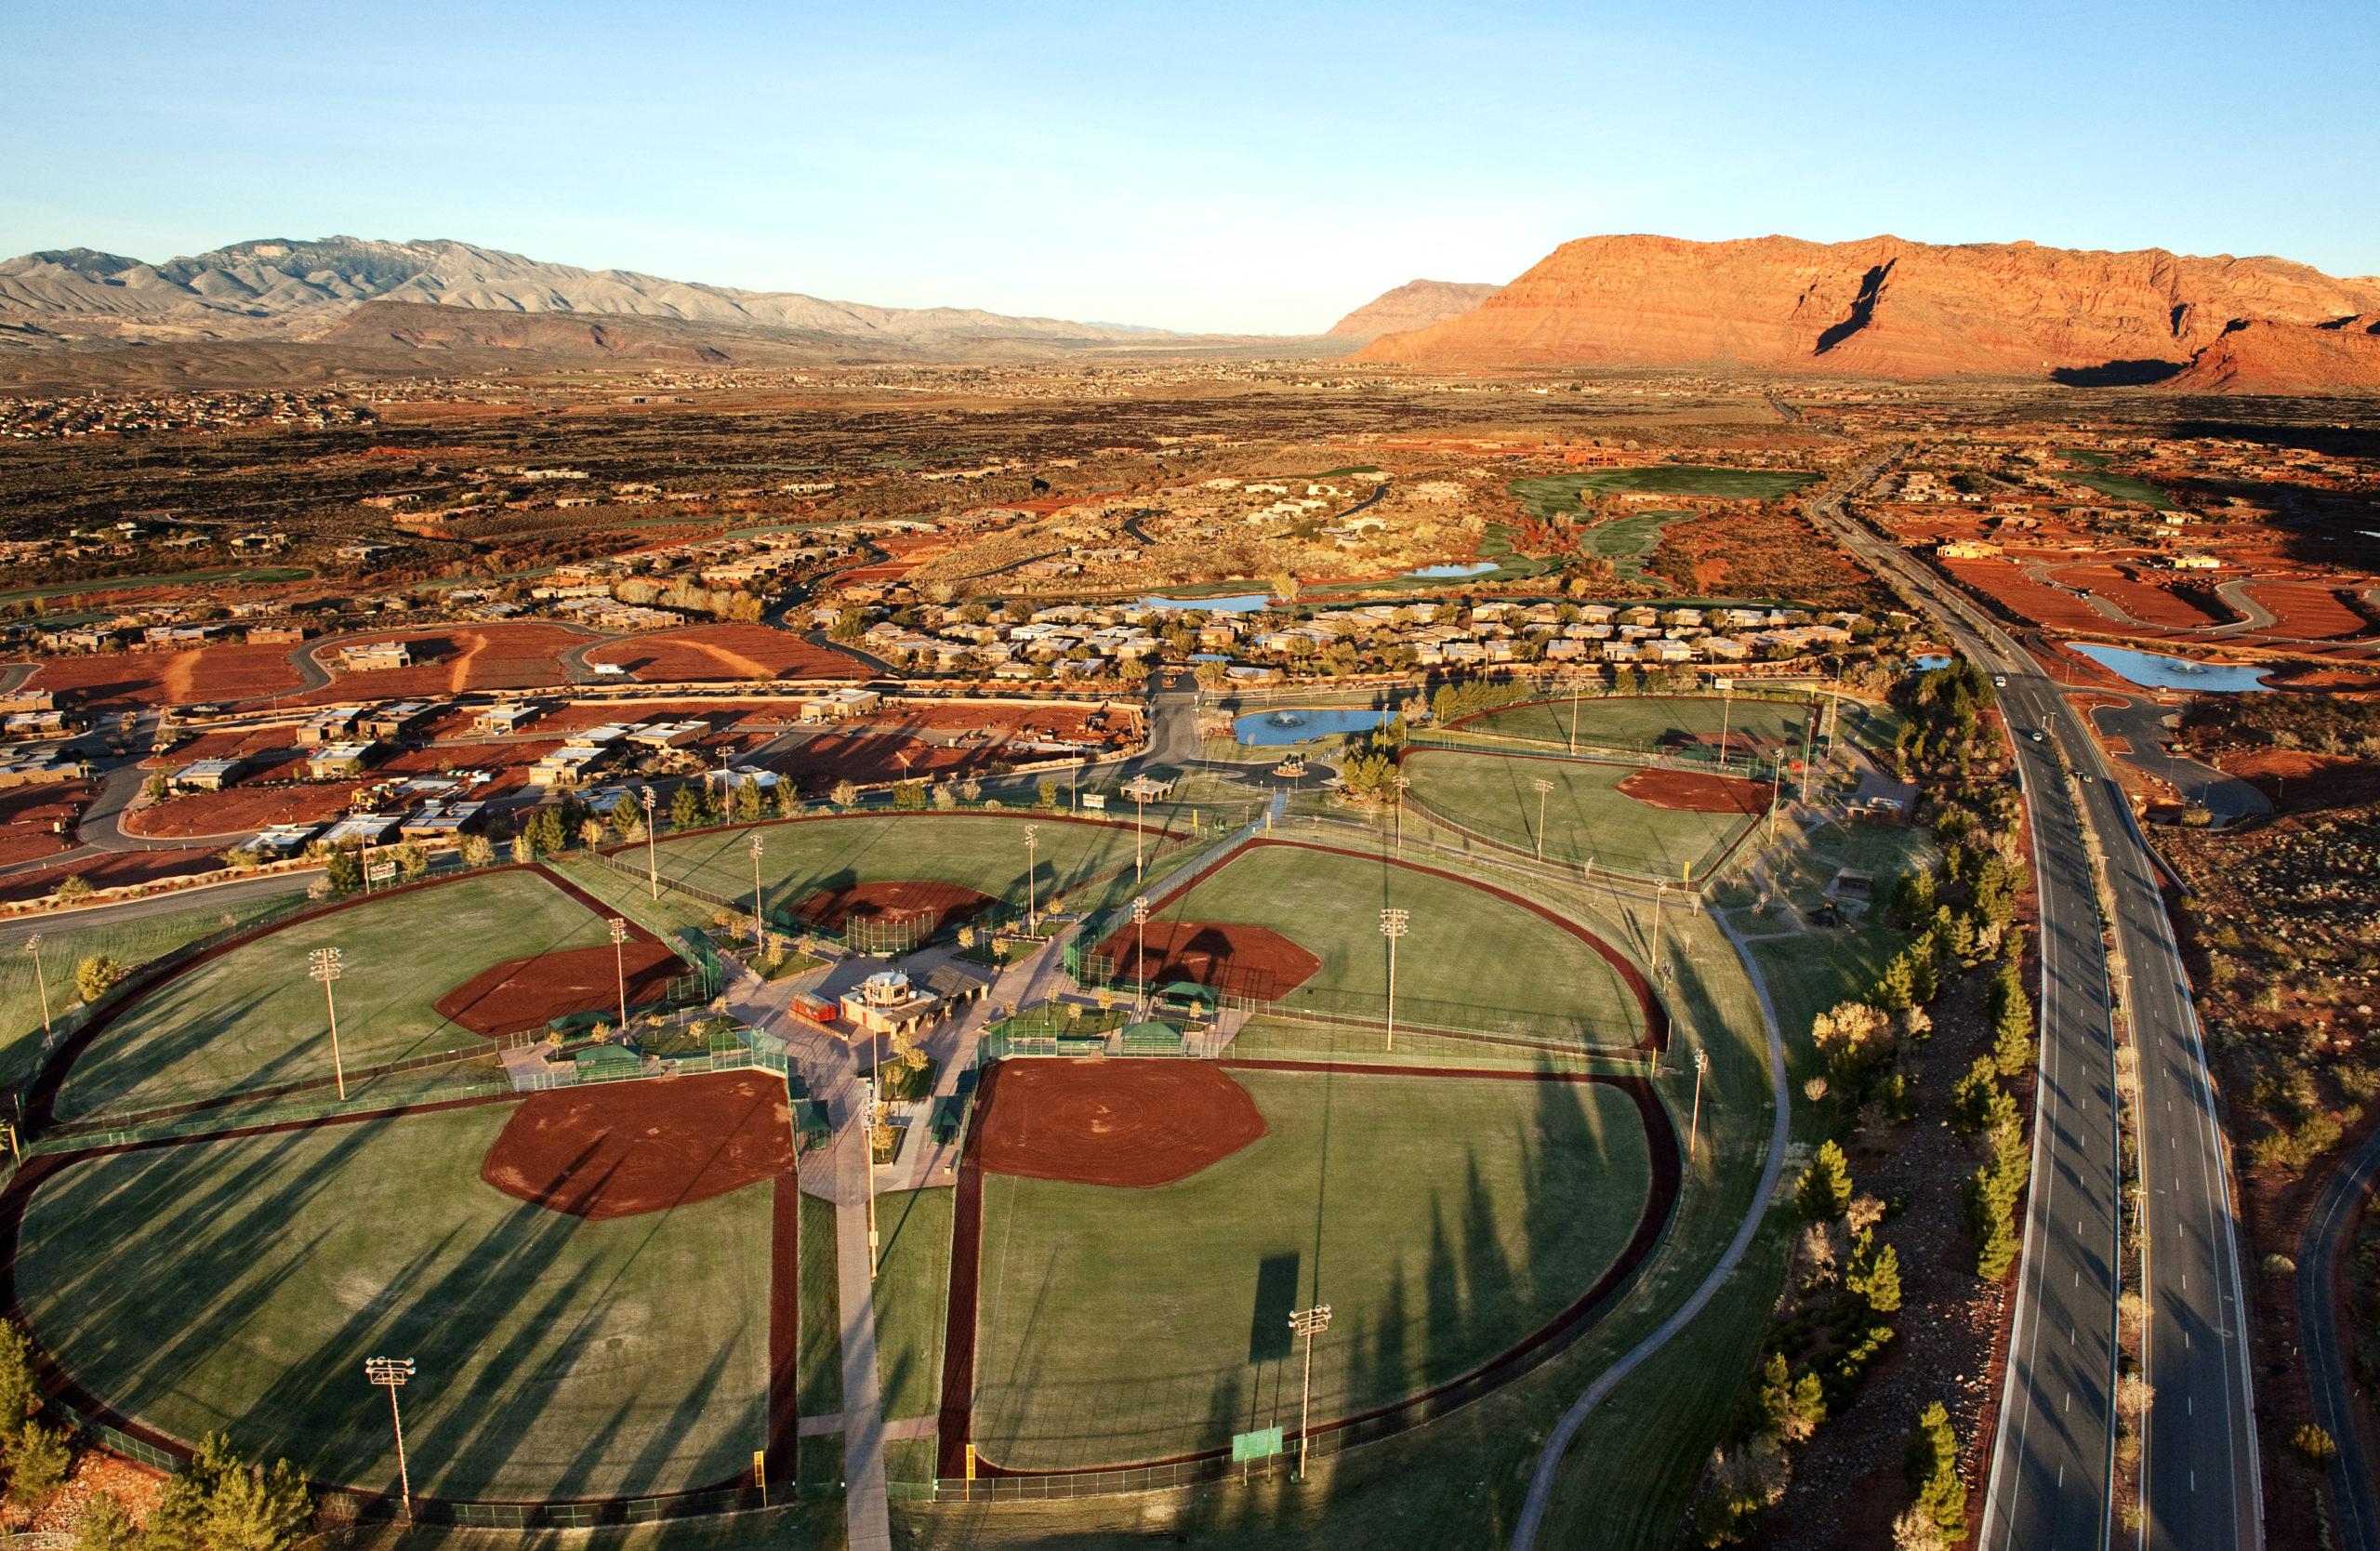 softball complex